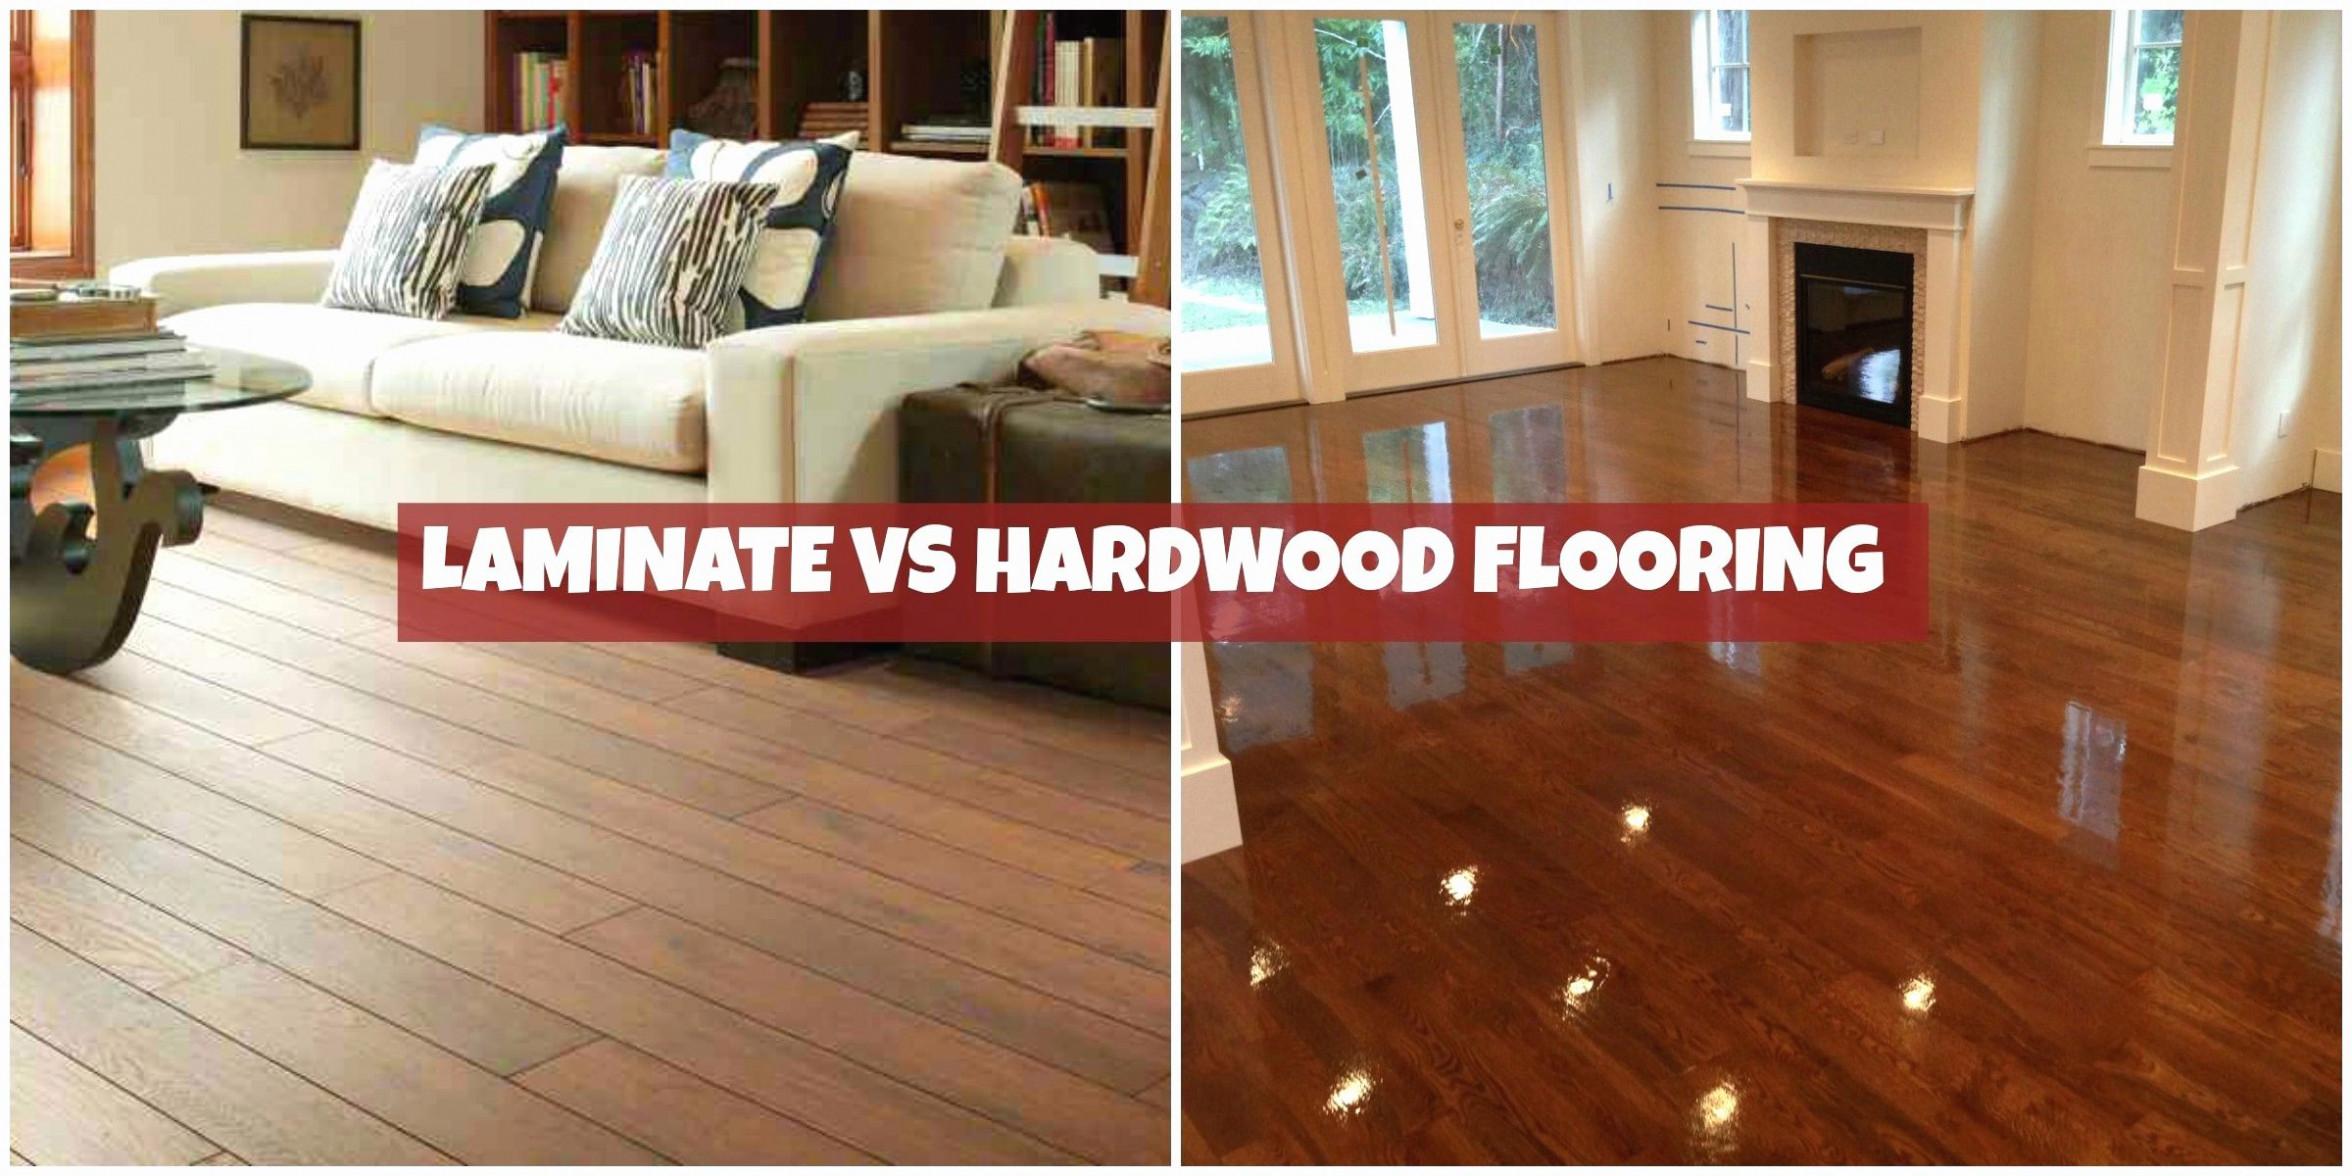 bamboo hardwood flooring cost of ceramic tile vs hardwood flooring flooring ideas with regard to 50 fresh ceramic tile vs hardwood flooring cost graphics s pertaining to wood laminate